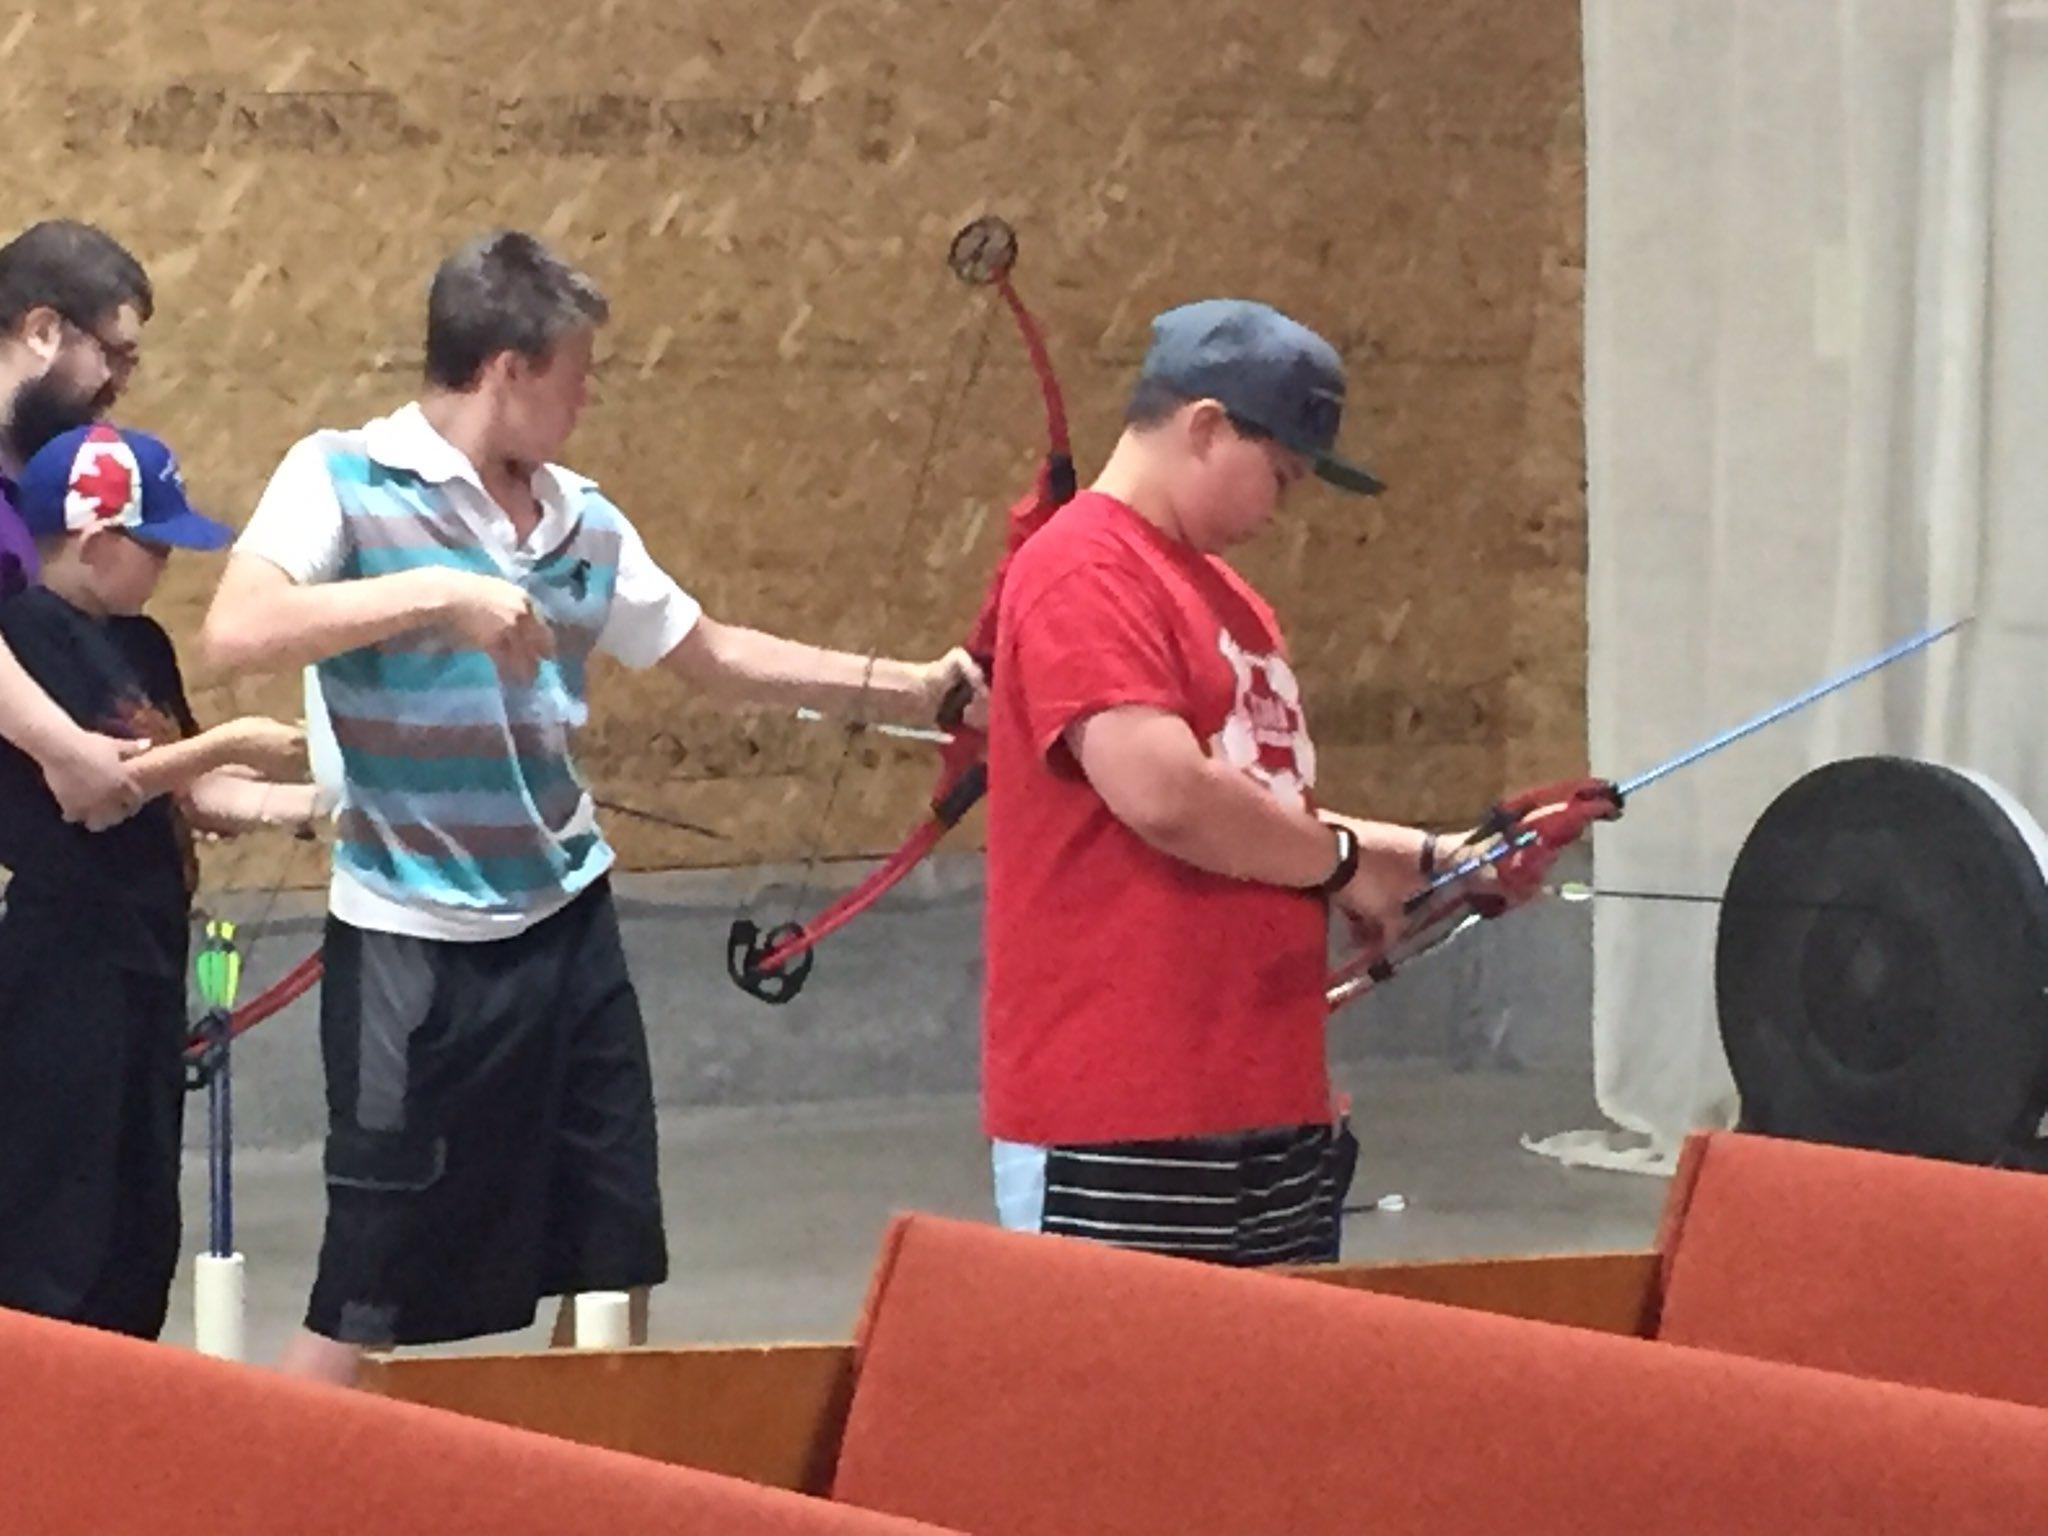 #donsch camping trip - archery https://t.co/wmcnUPXVCI